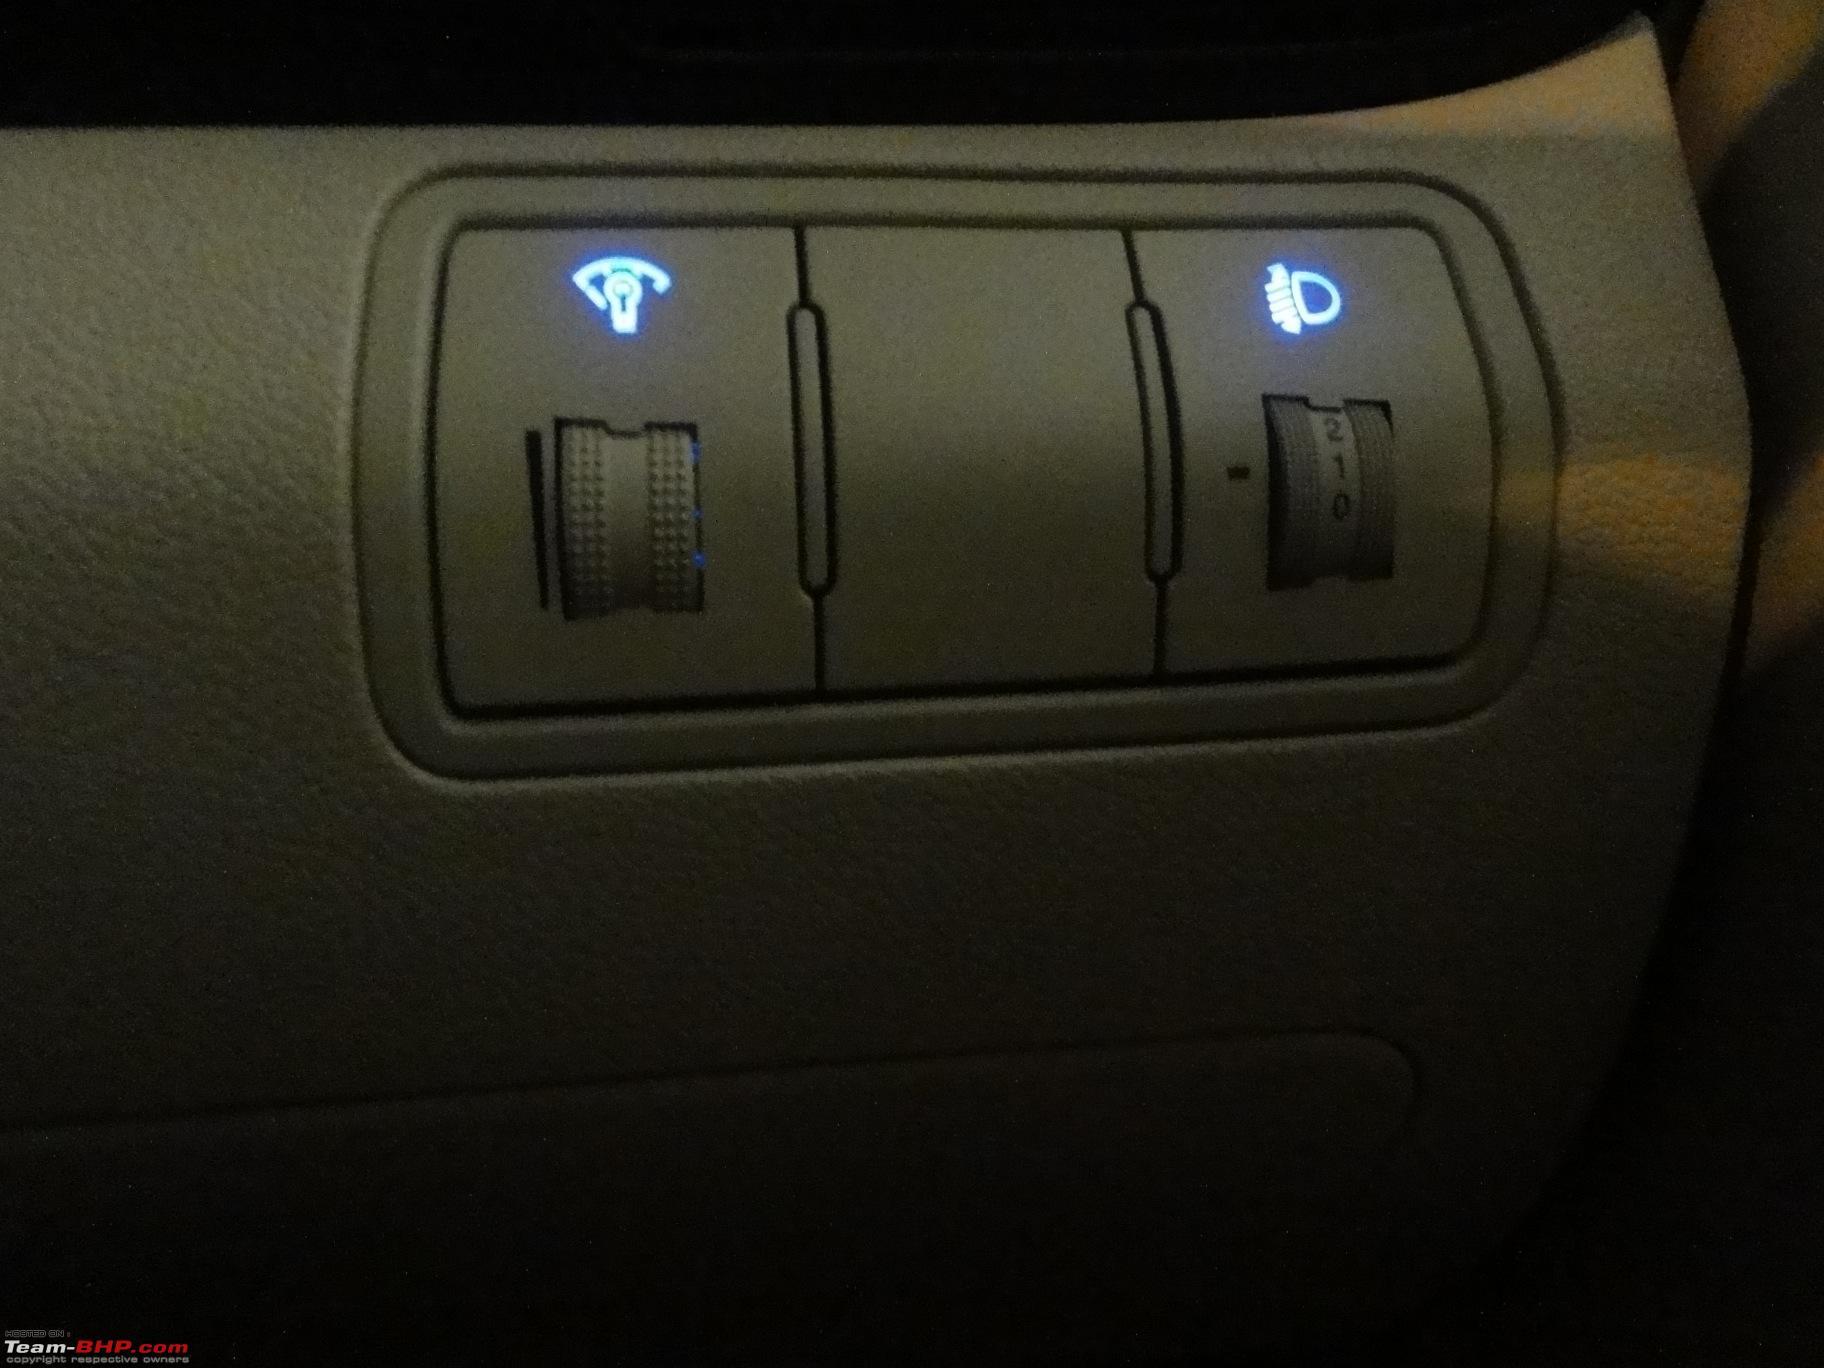 My Fluidic Hyundai Verna Sx 16l Crdi Team Bhp Car Interior Lights Delay Dsc00011